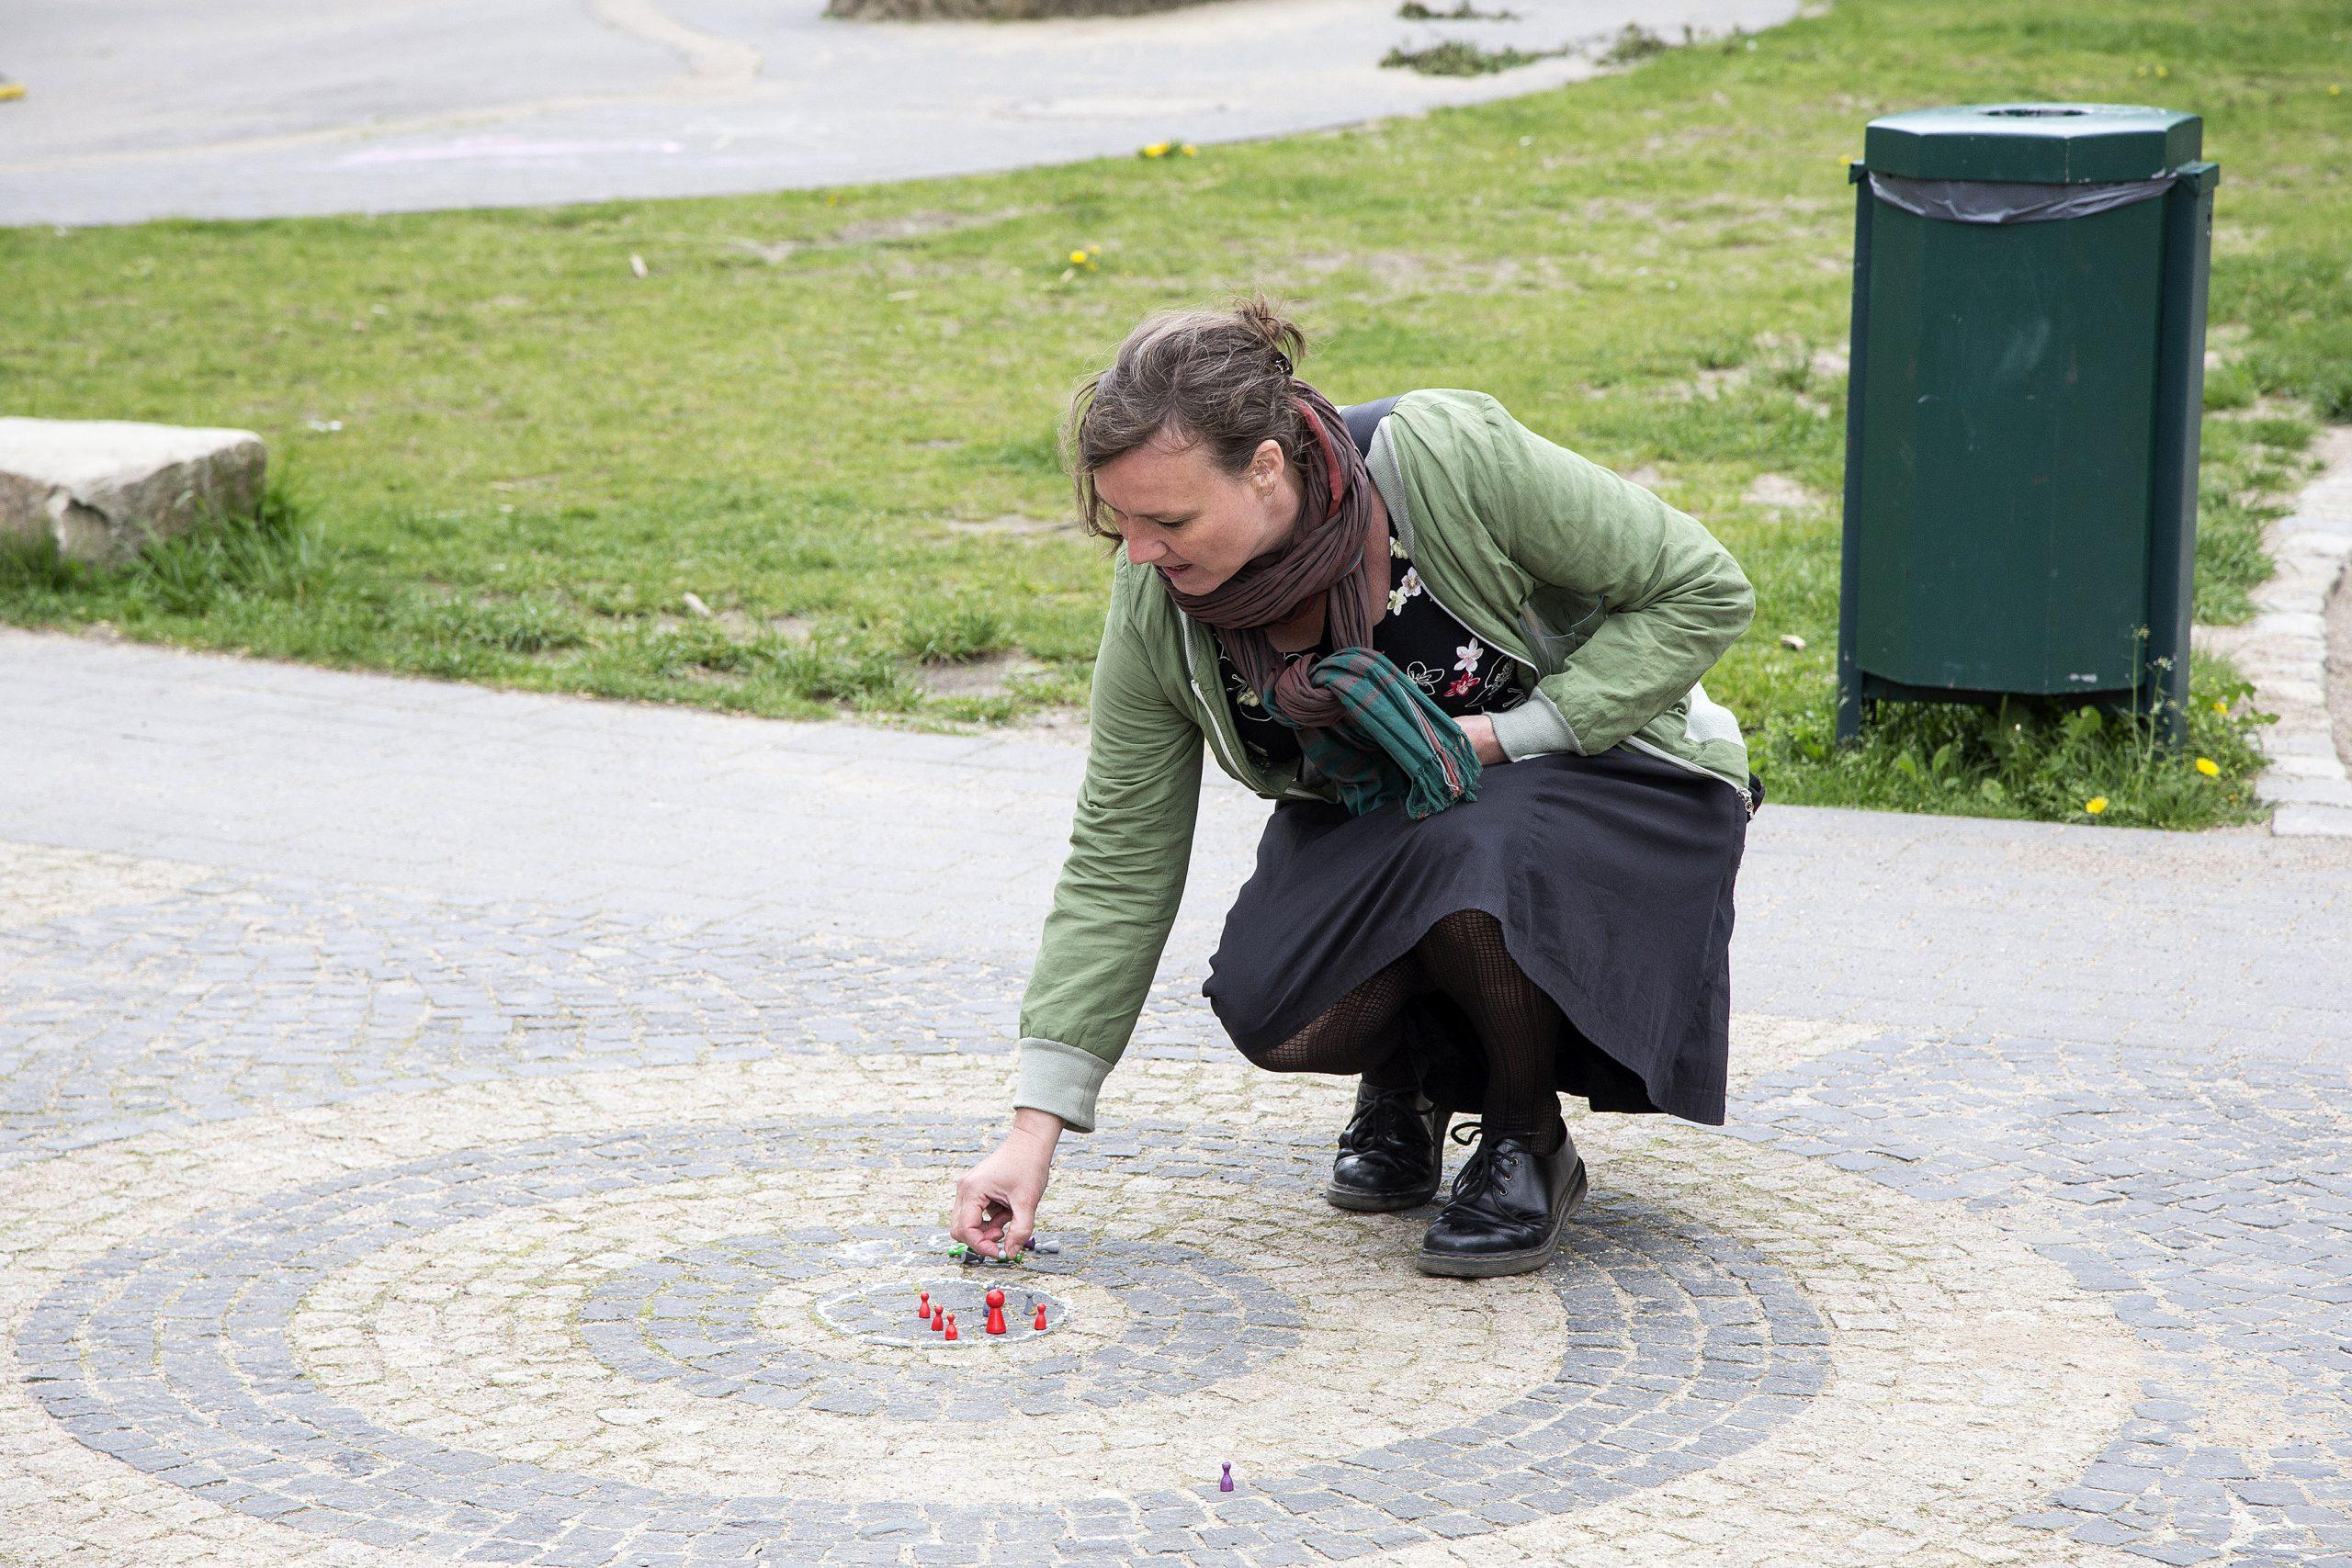 Hilke Marit Berger, Playing Society?, 2013, Hamburg